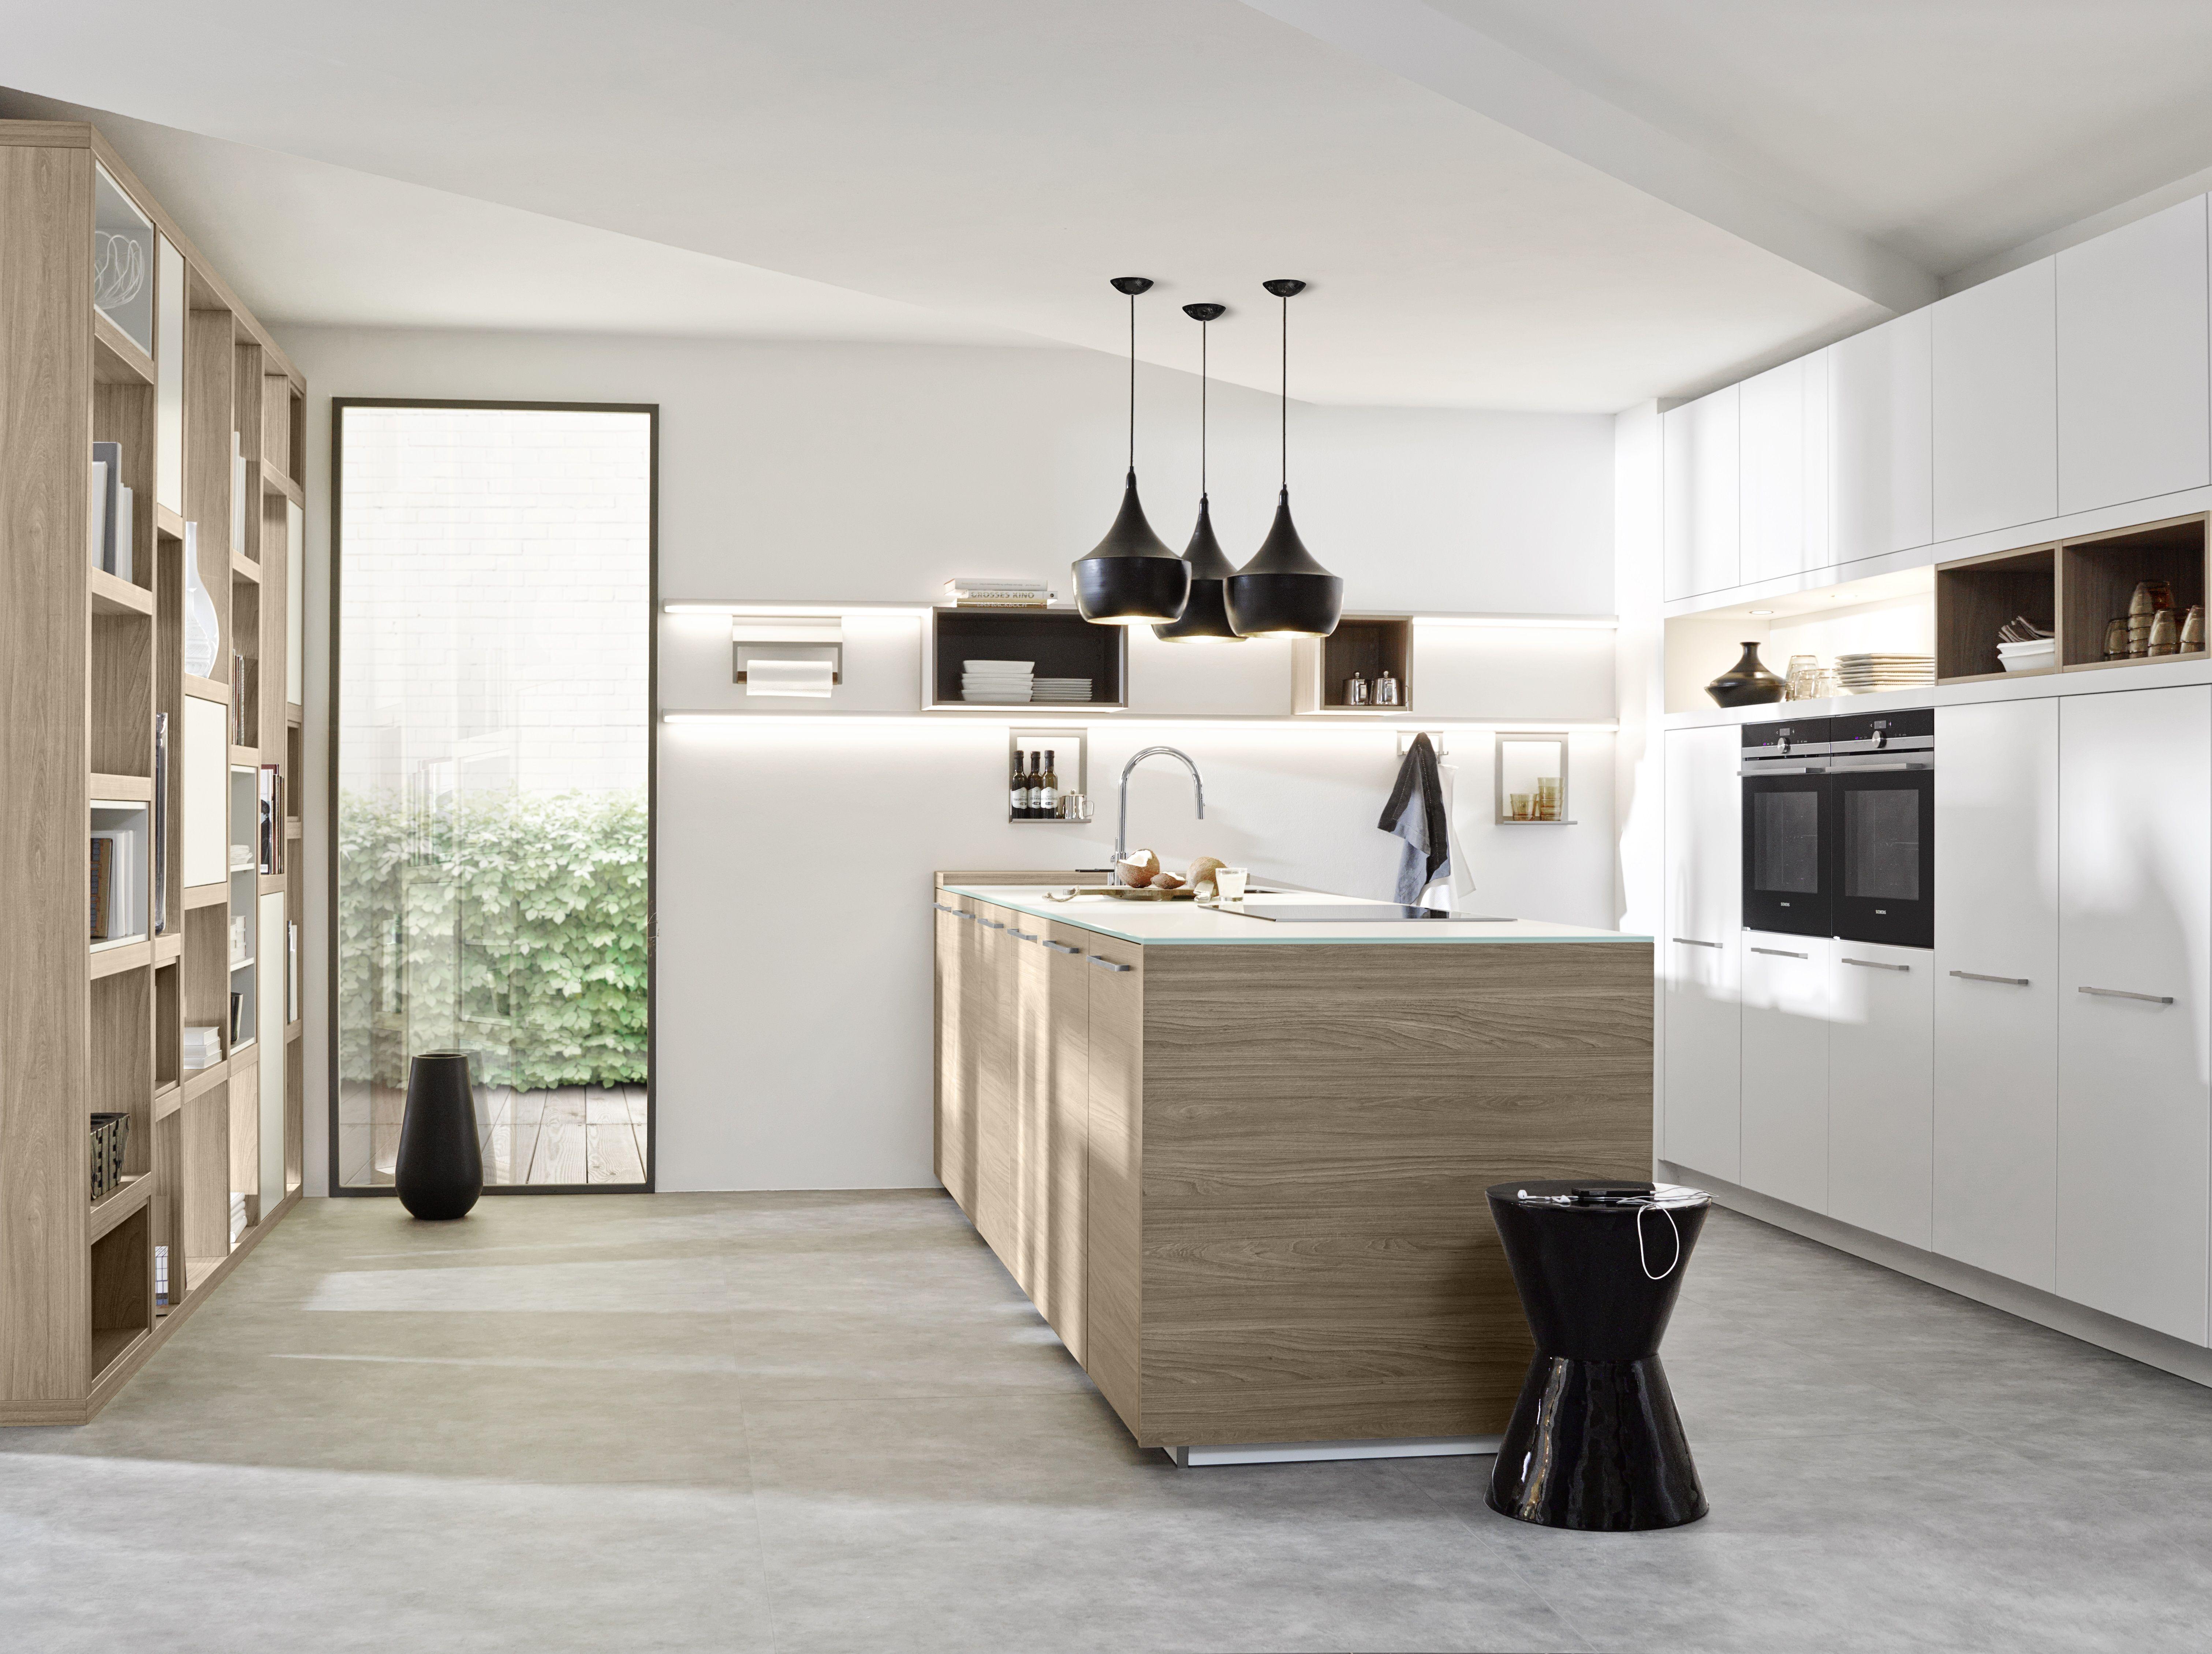 Soft Lack kitchen inspiration ideas modern contemporary